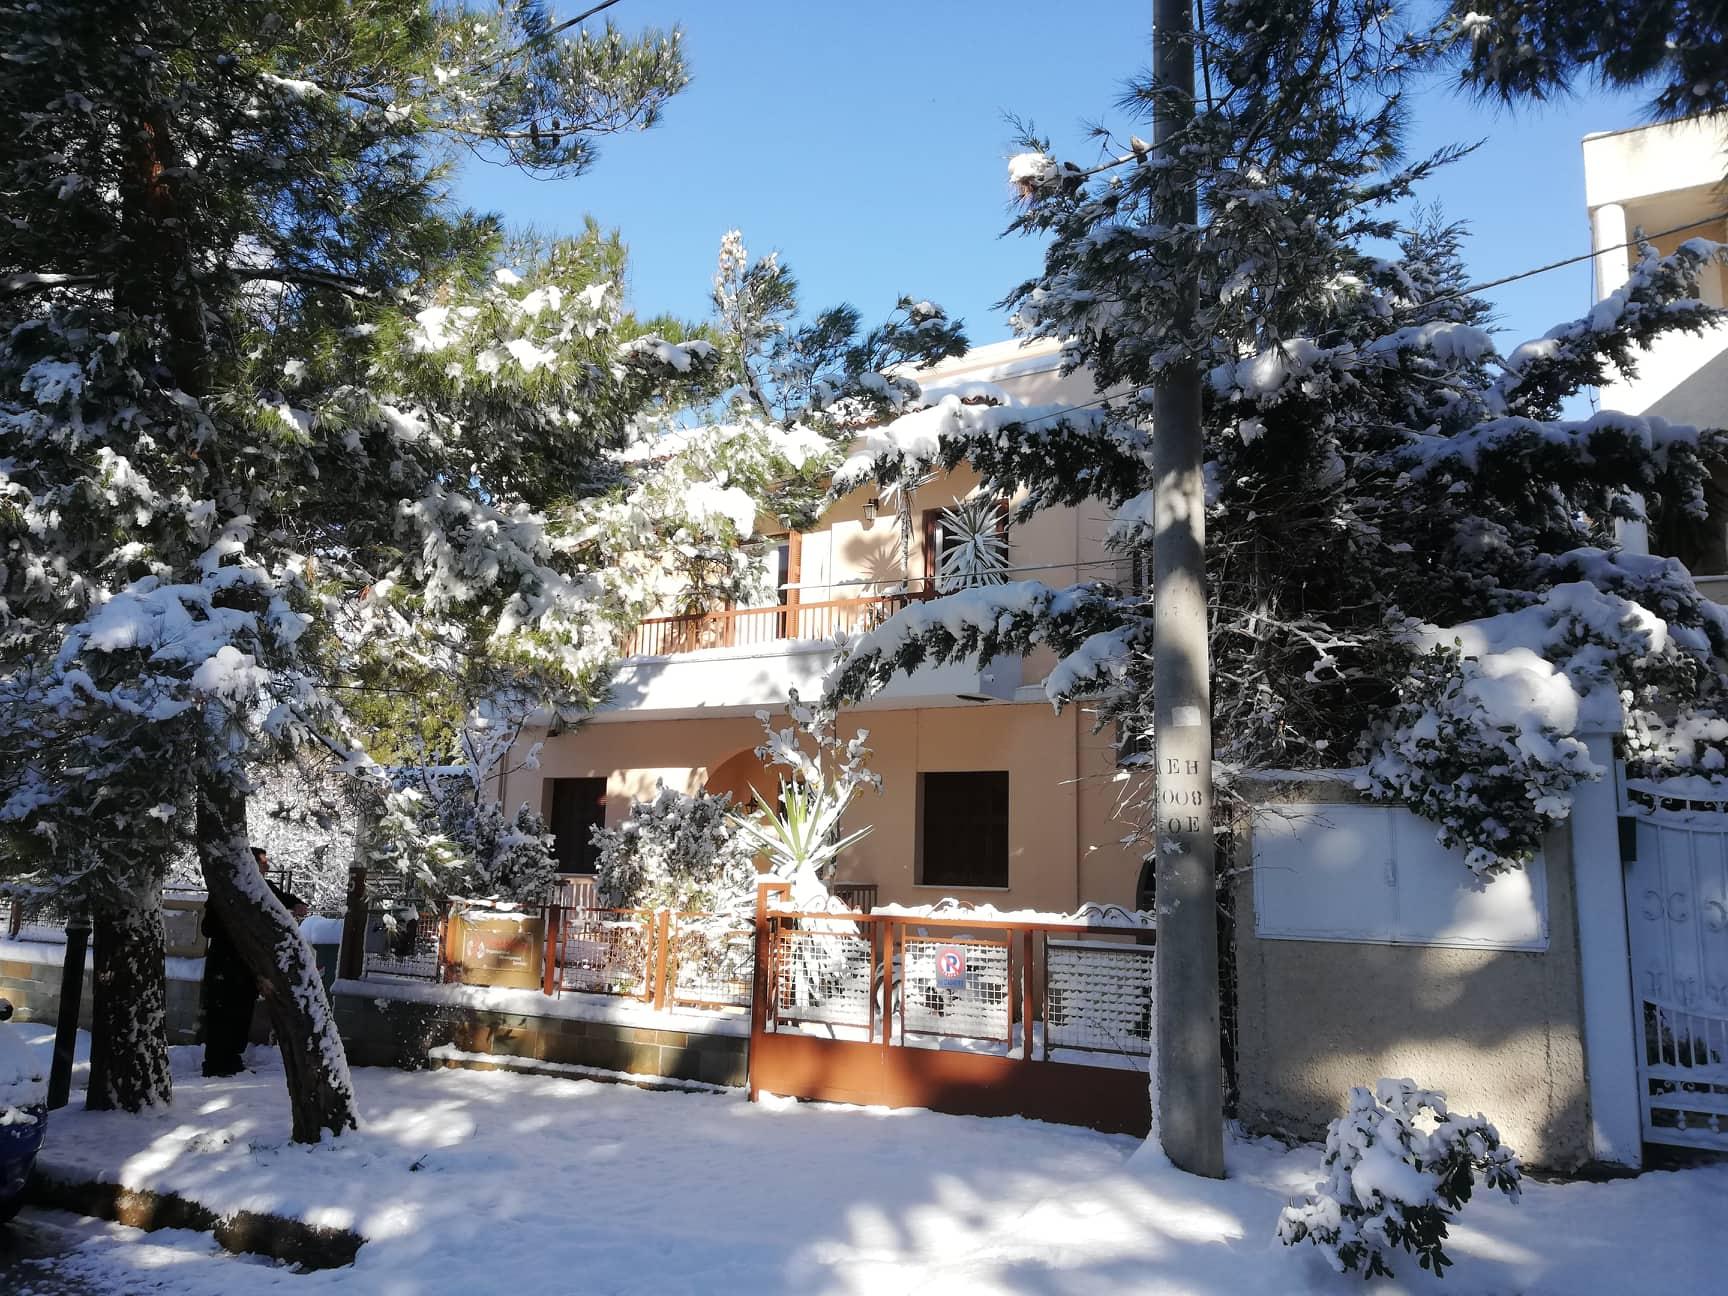 snowy kifissia